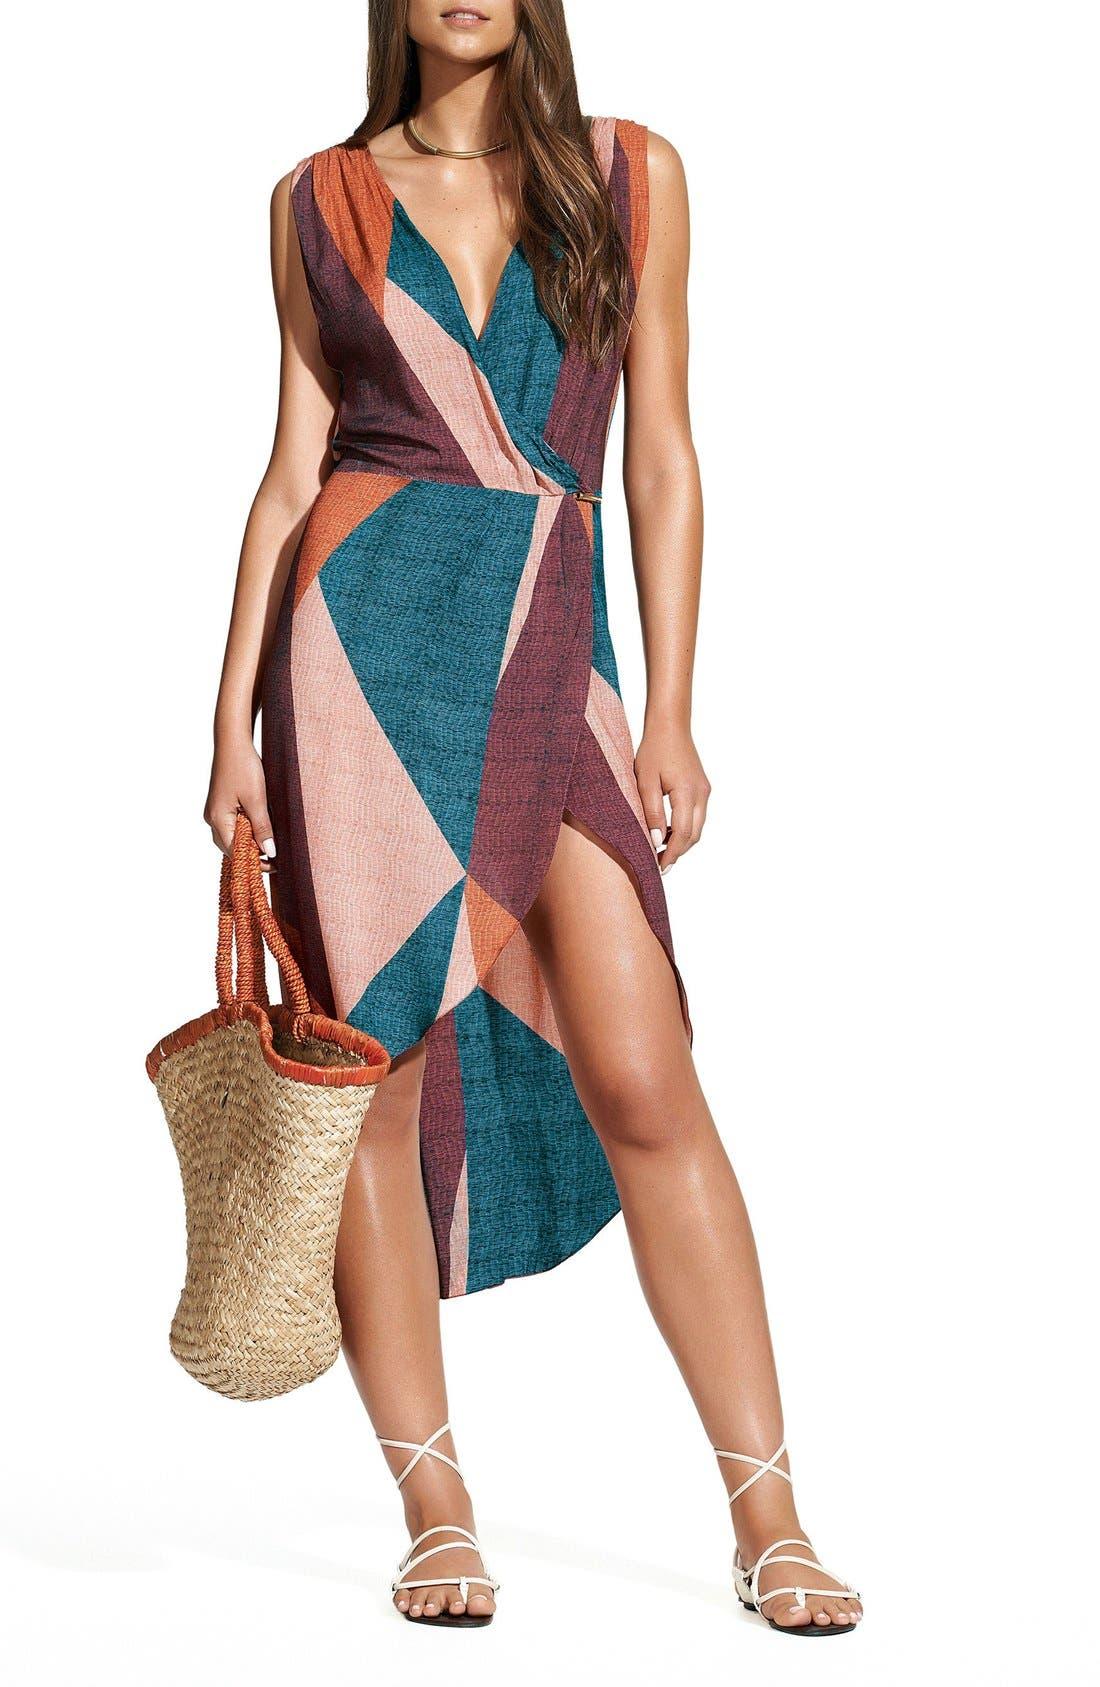 Main Image - ViX Swimwear Ananda Gisele Colorblock Caftan